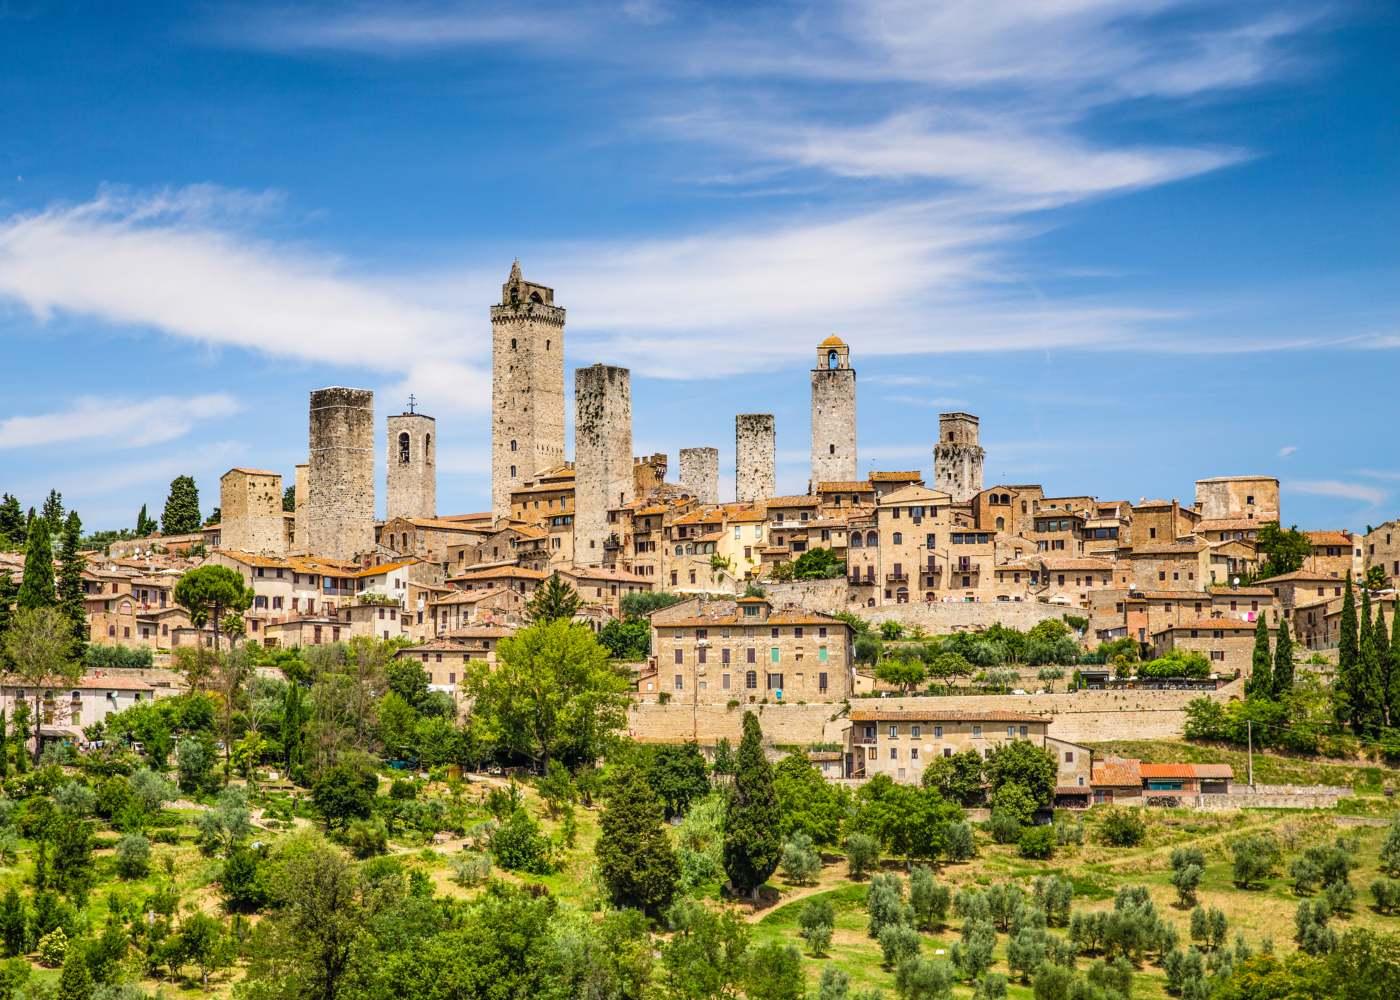 Vista da cidade de San Gimignano